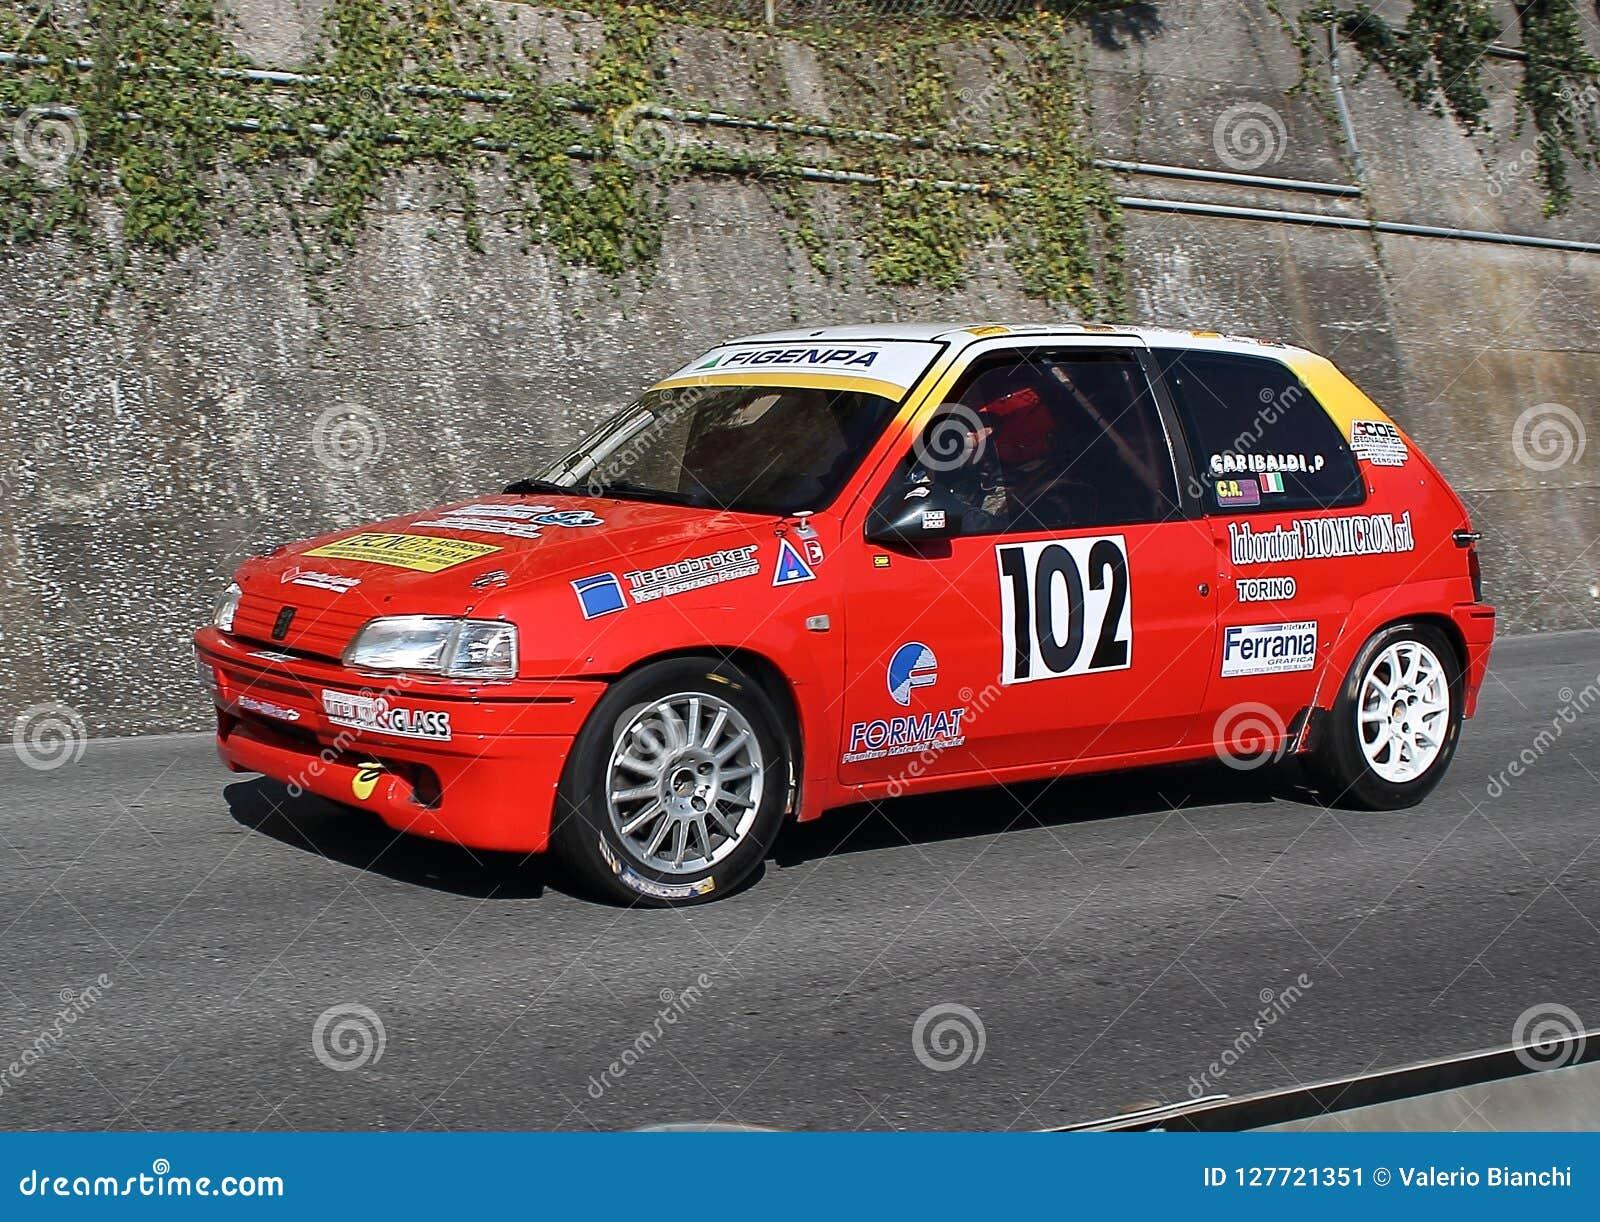 Peugeot 106 Rallye Race Car During The Race Editorial Photo Image Of Piloting Single 127721351